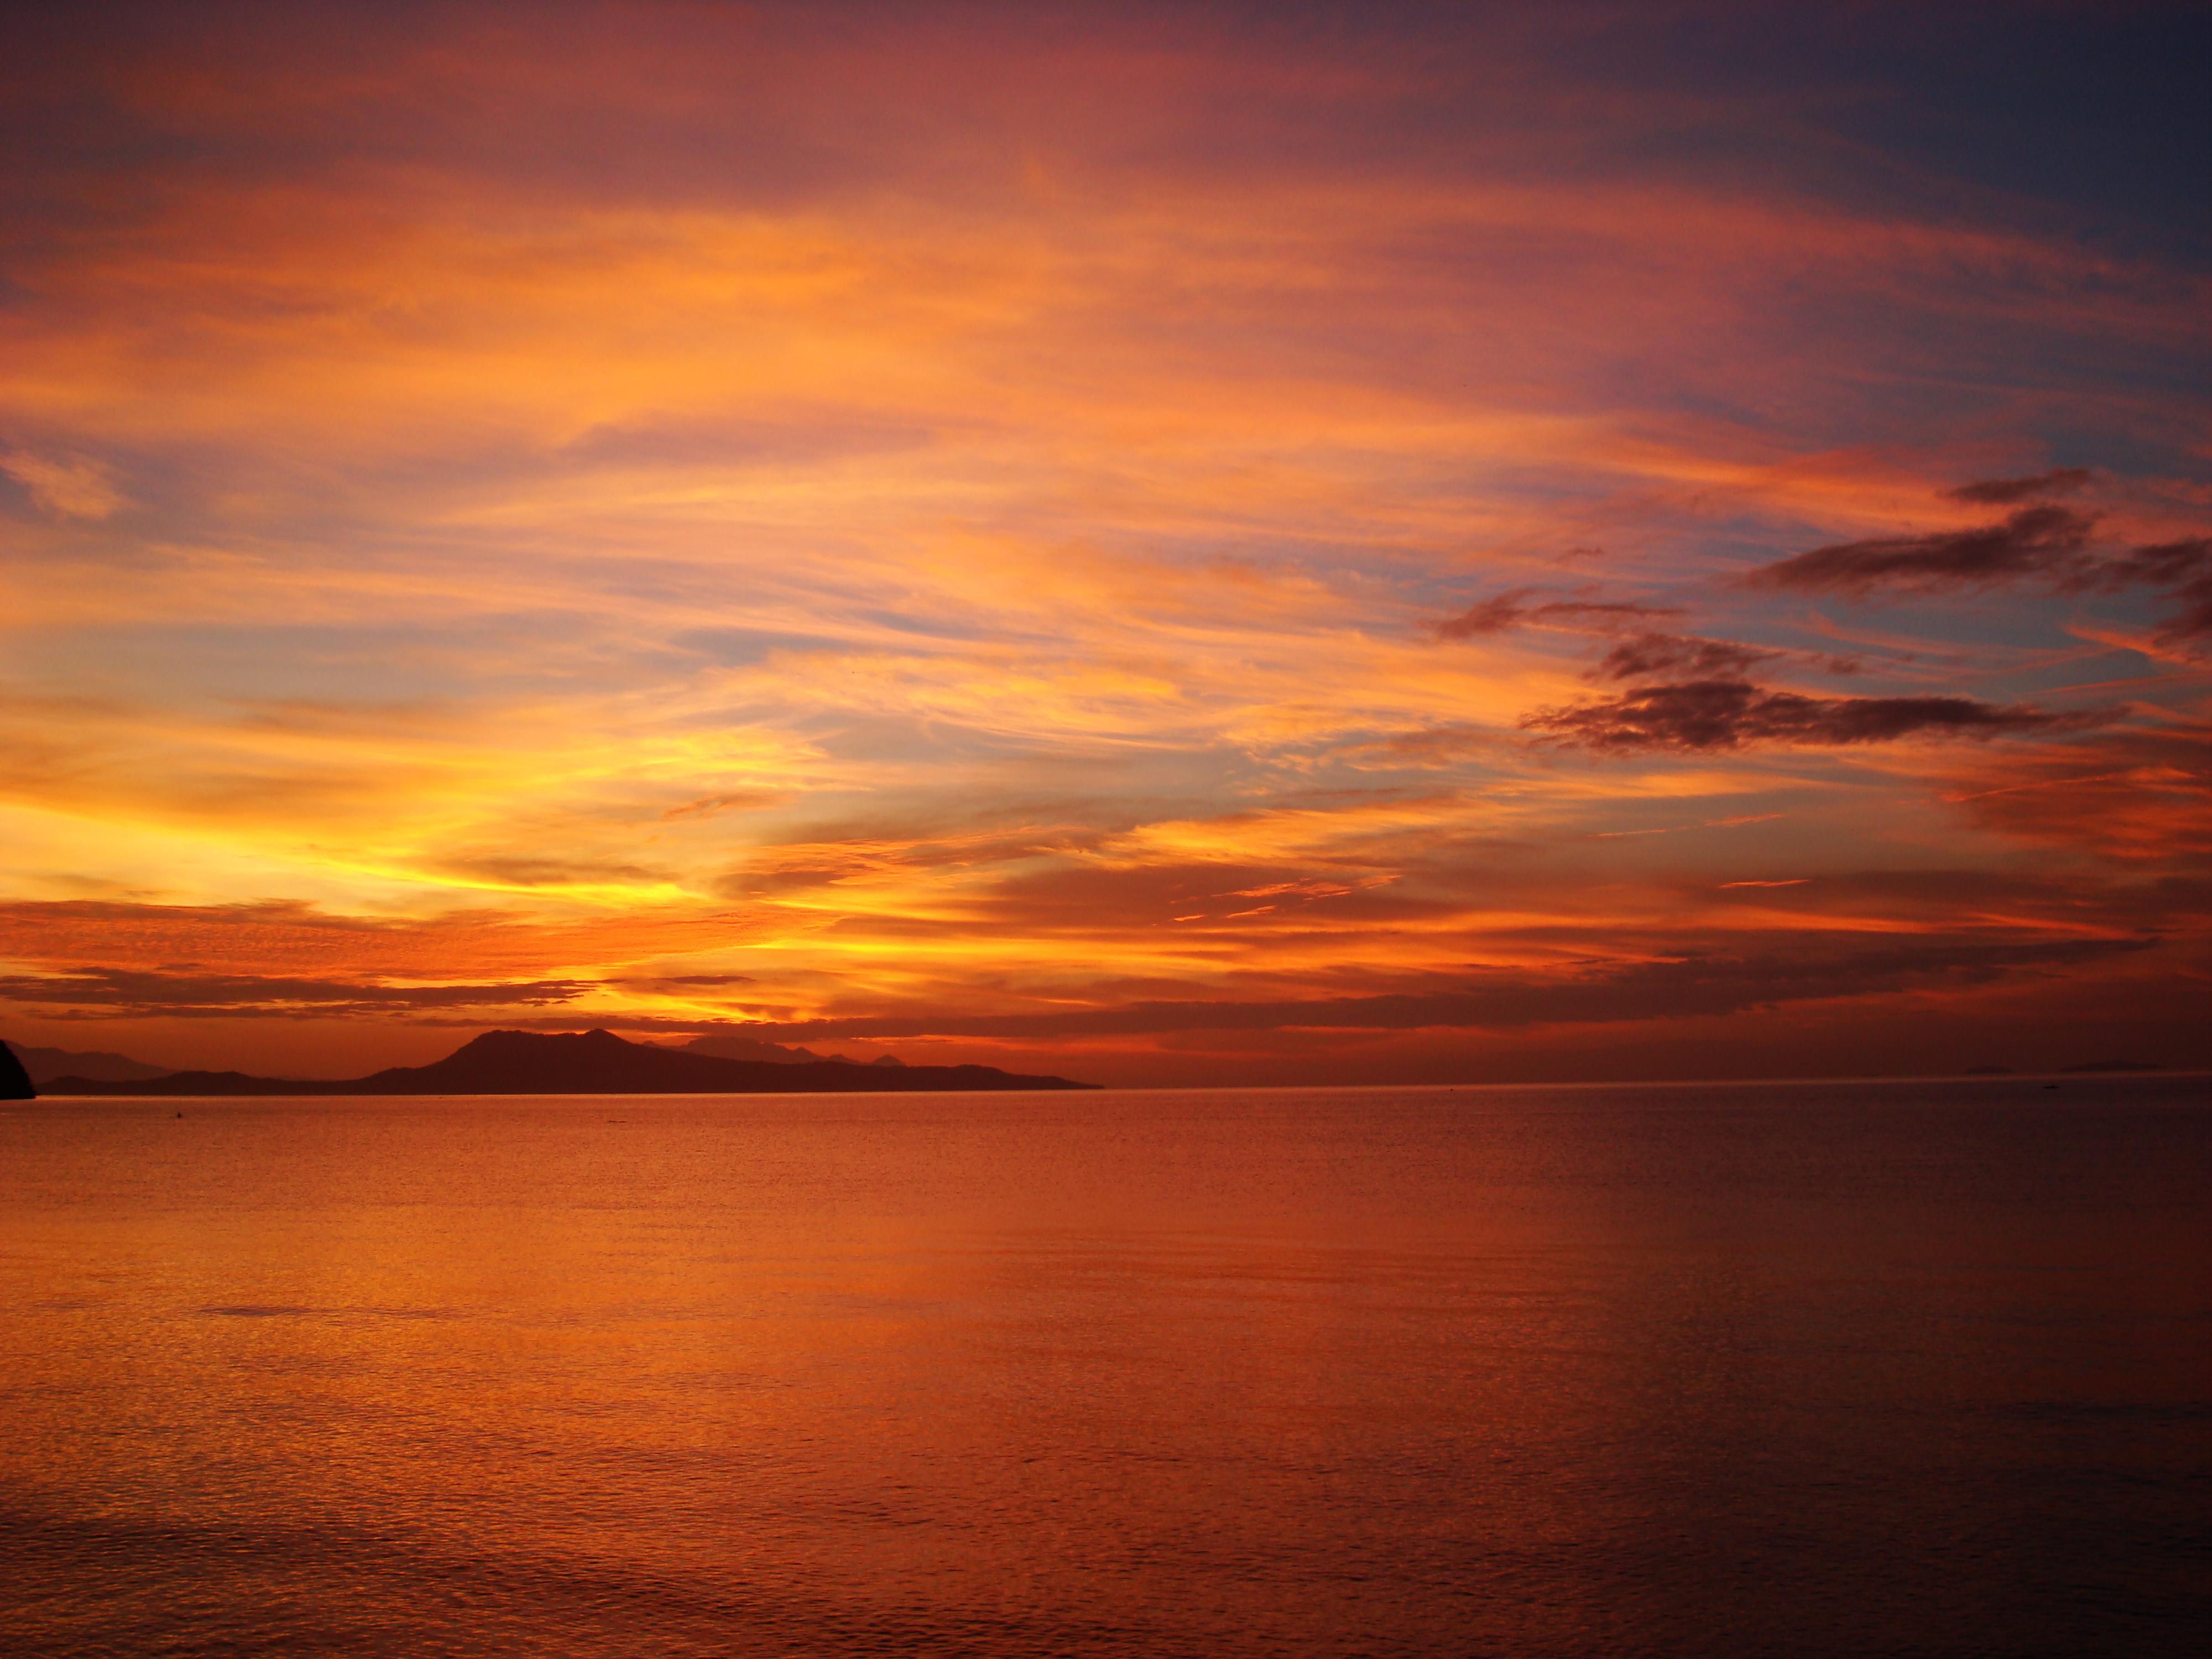 Sunrise Philippines Mindoro Island Tabinay 53